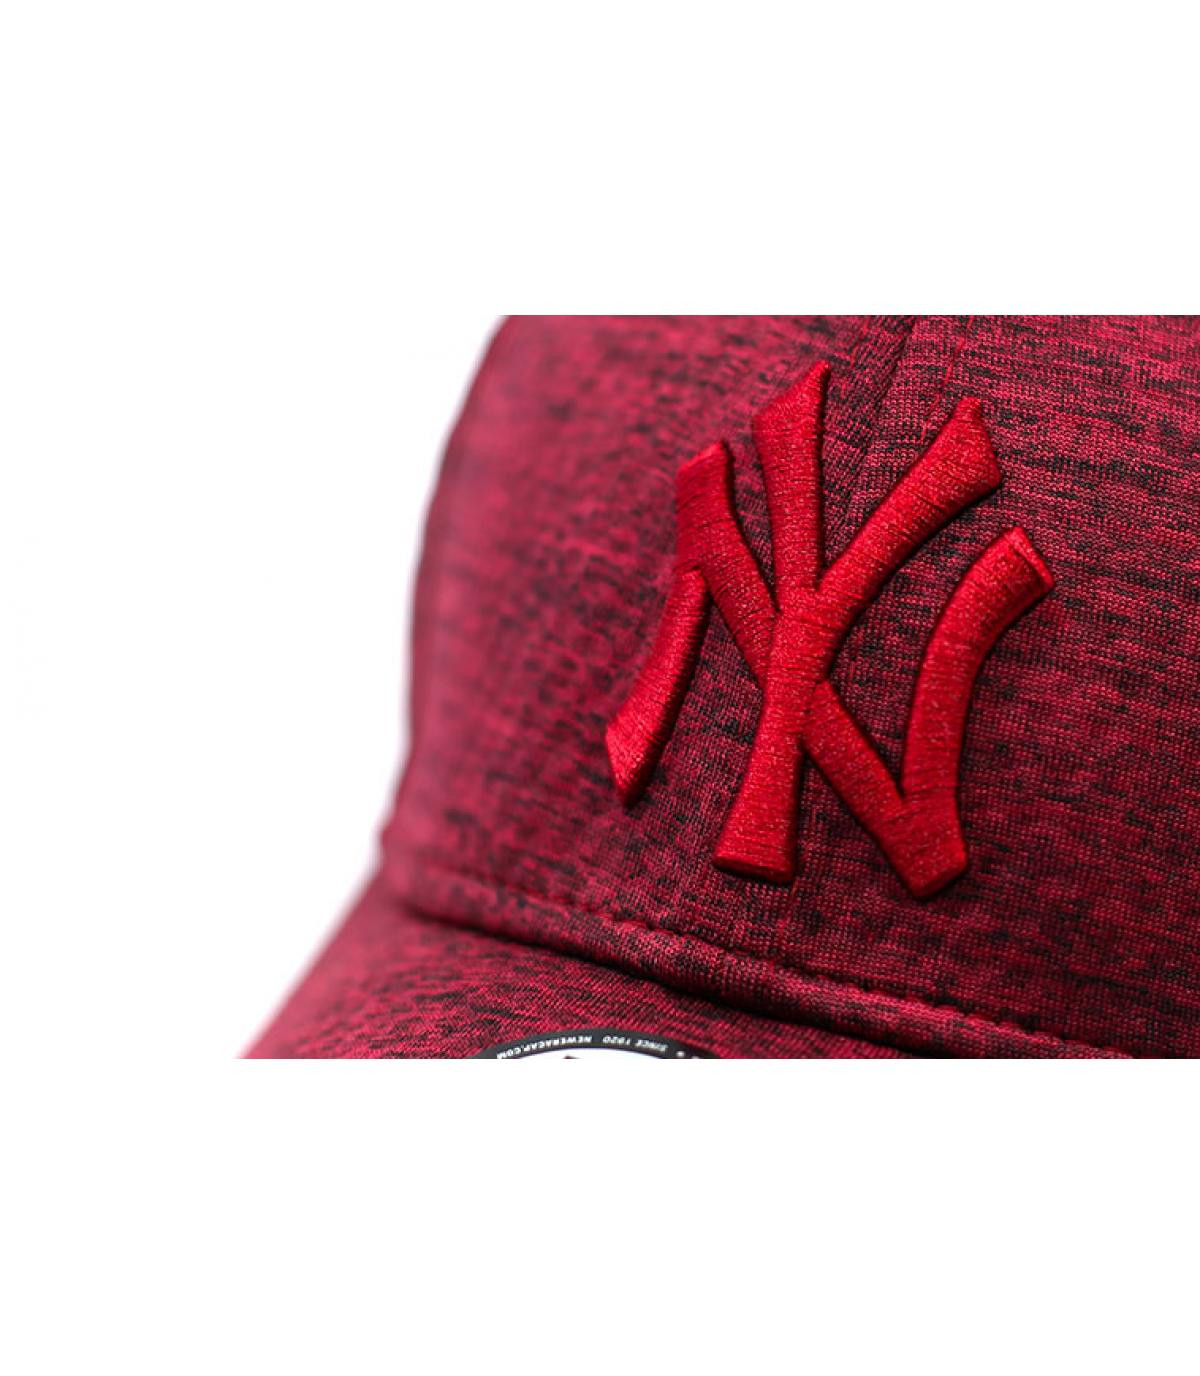 Dettagli Dry Switch NY 39Thirty cardinal - image 3